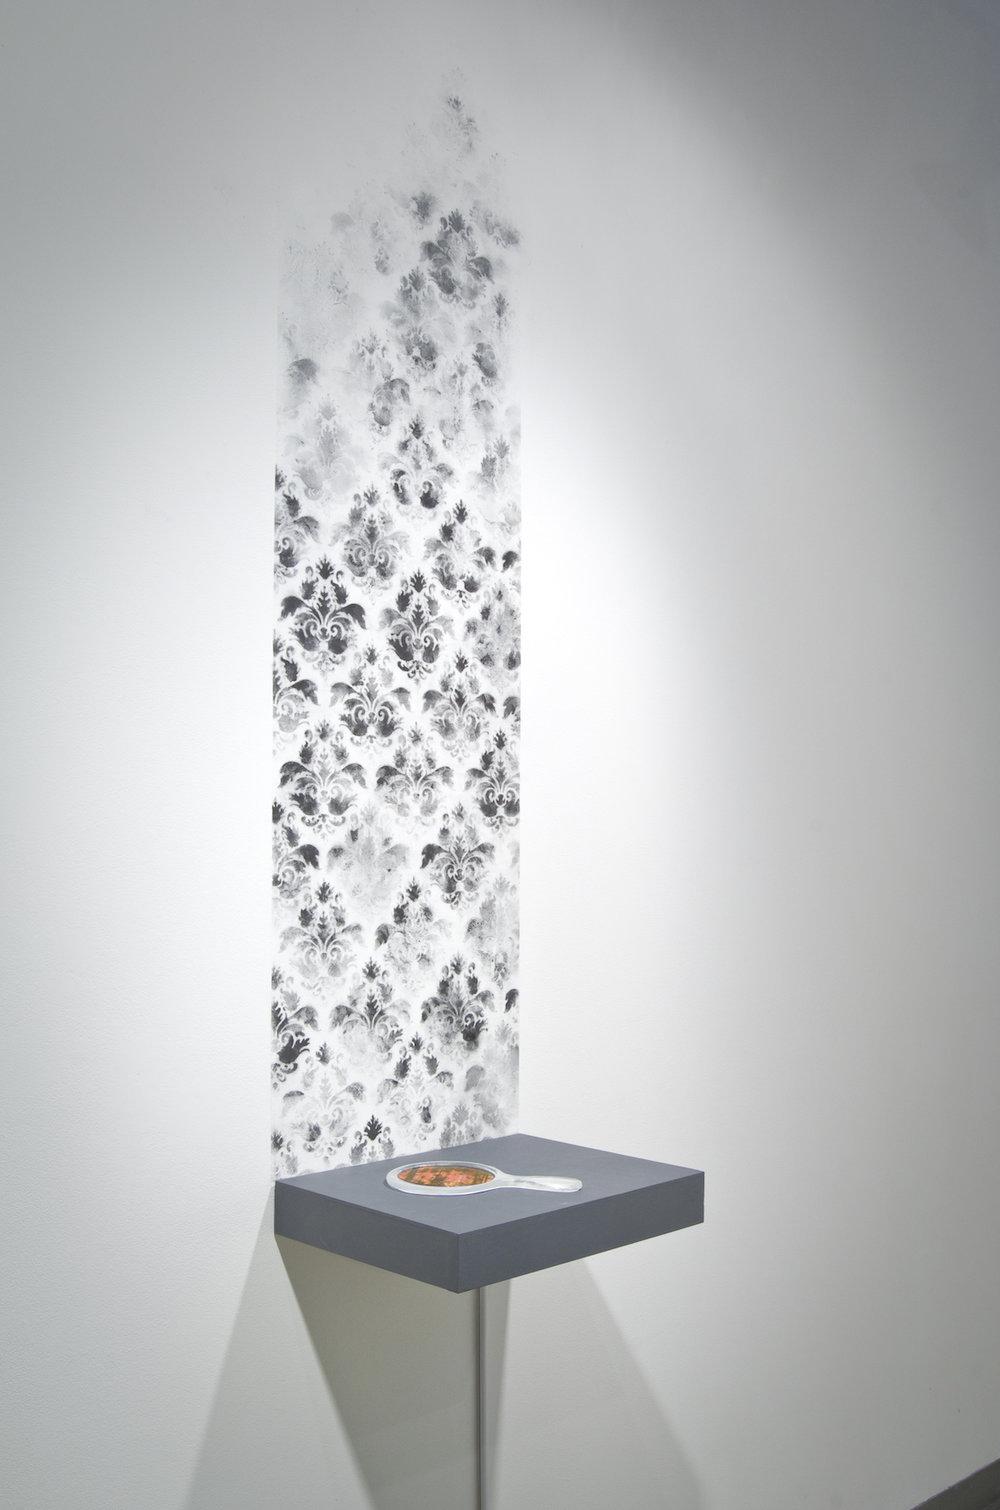 Will You Miss Me When I Burn  (Art Academy of Cincinnati), Ash, kiln cast glass, video, wood,2012